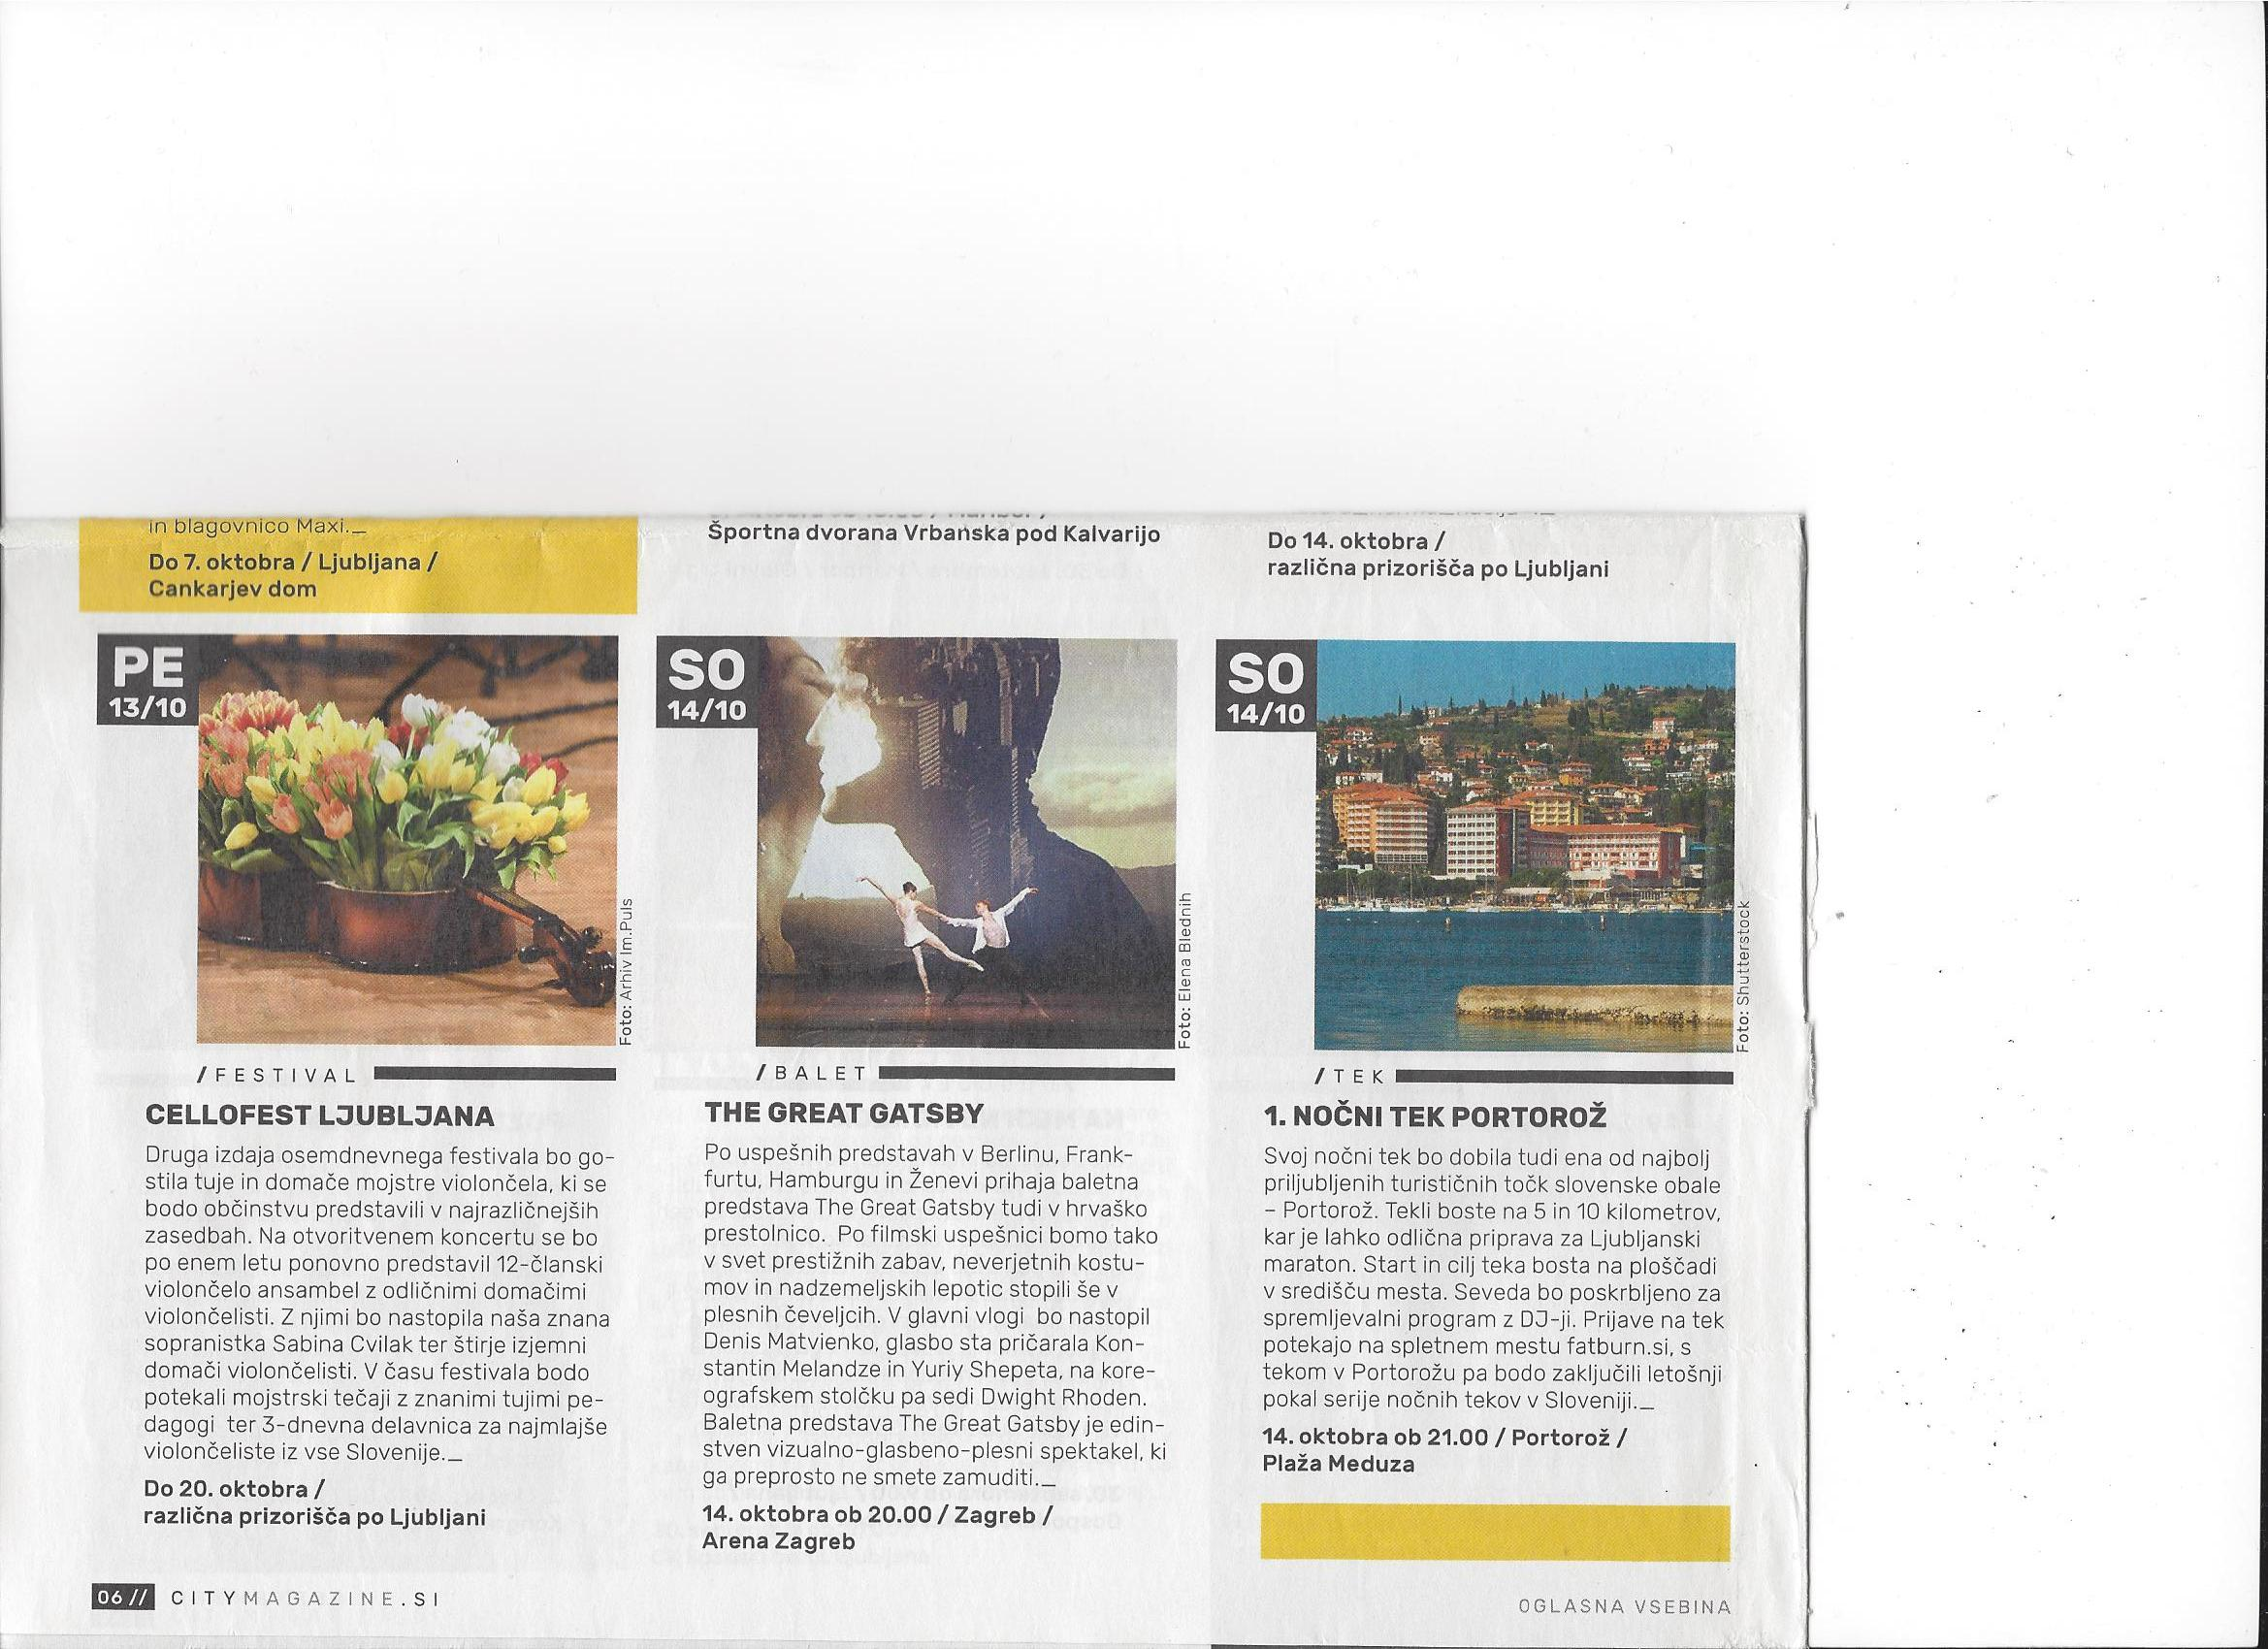 city magazine.jpg